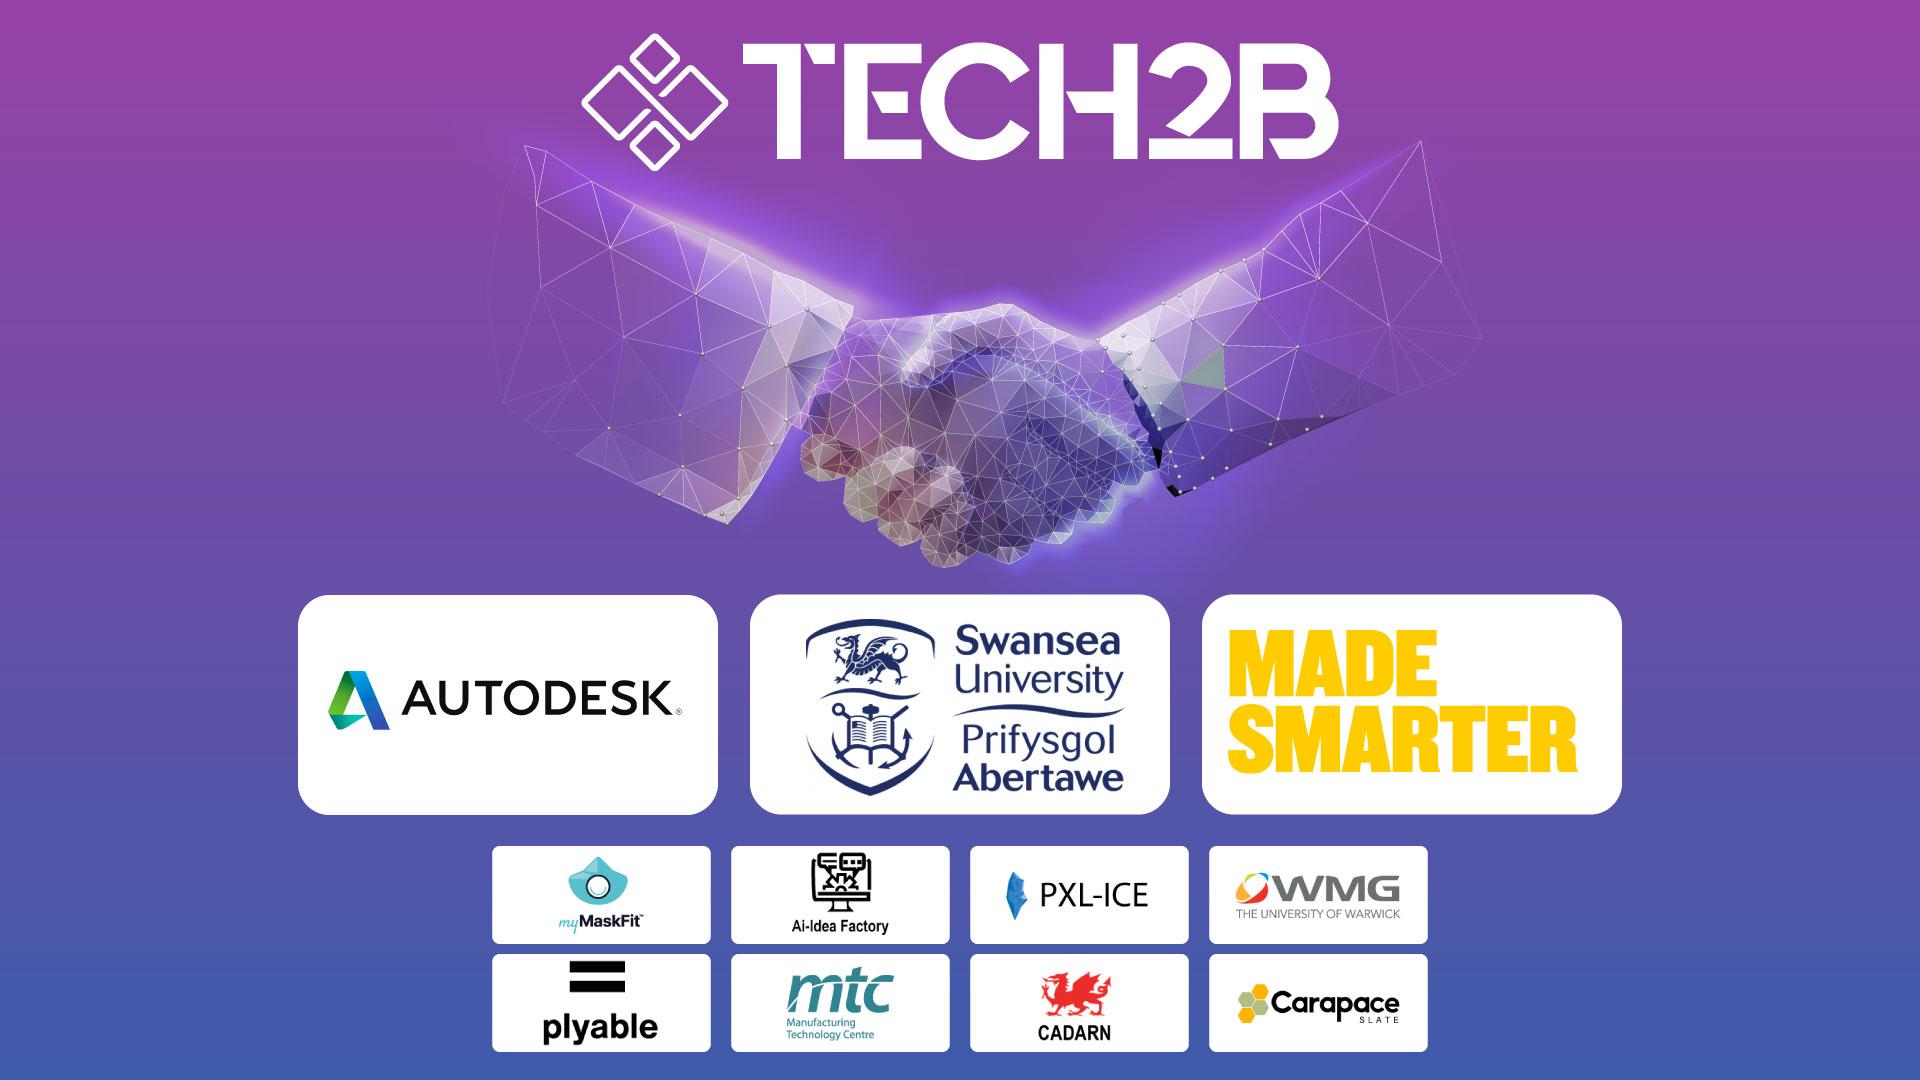 tech2b-b2b-platform-maakindustrie-partnership-autodesk